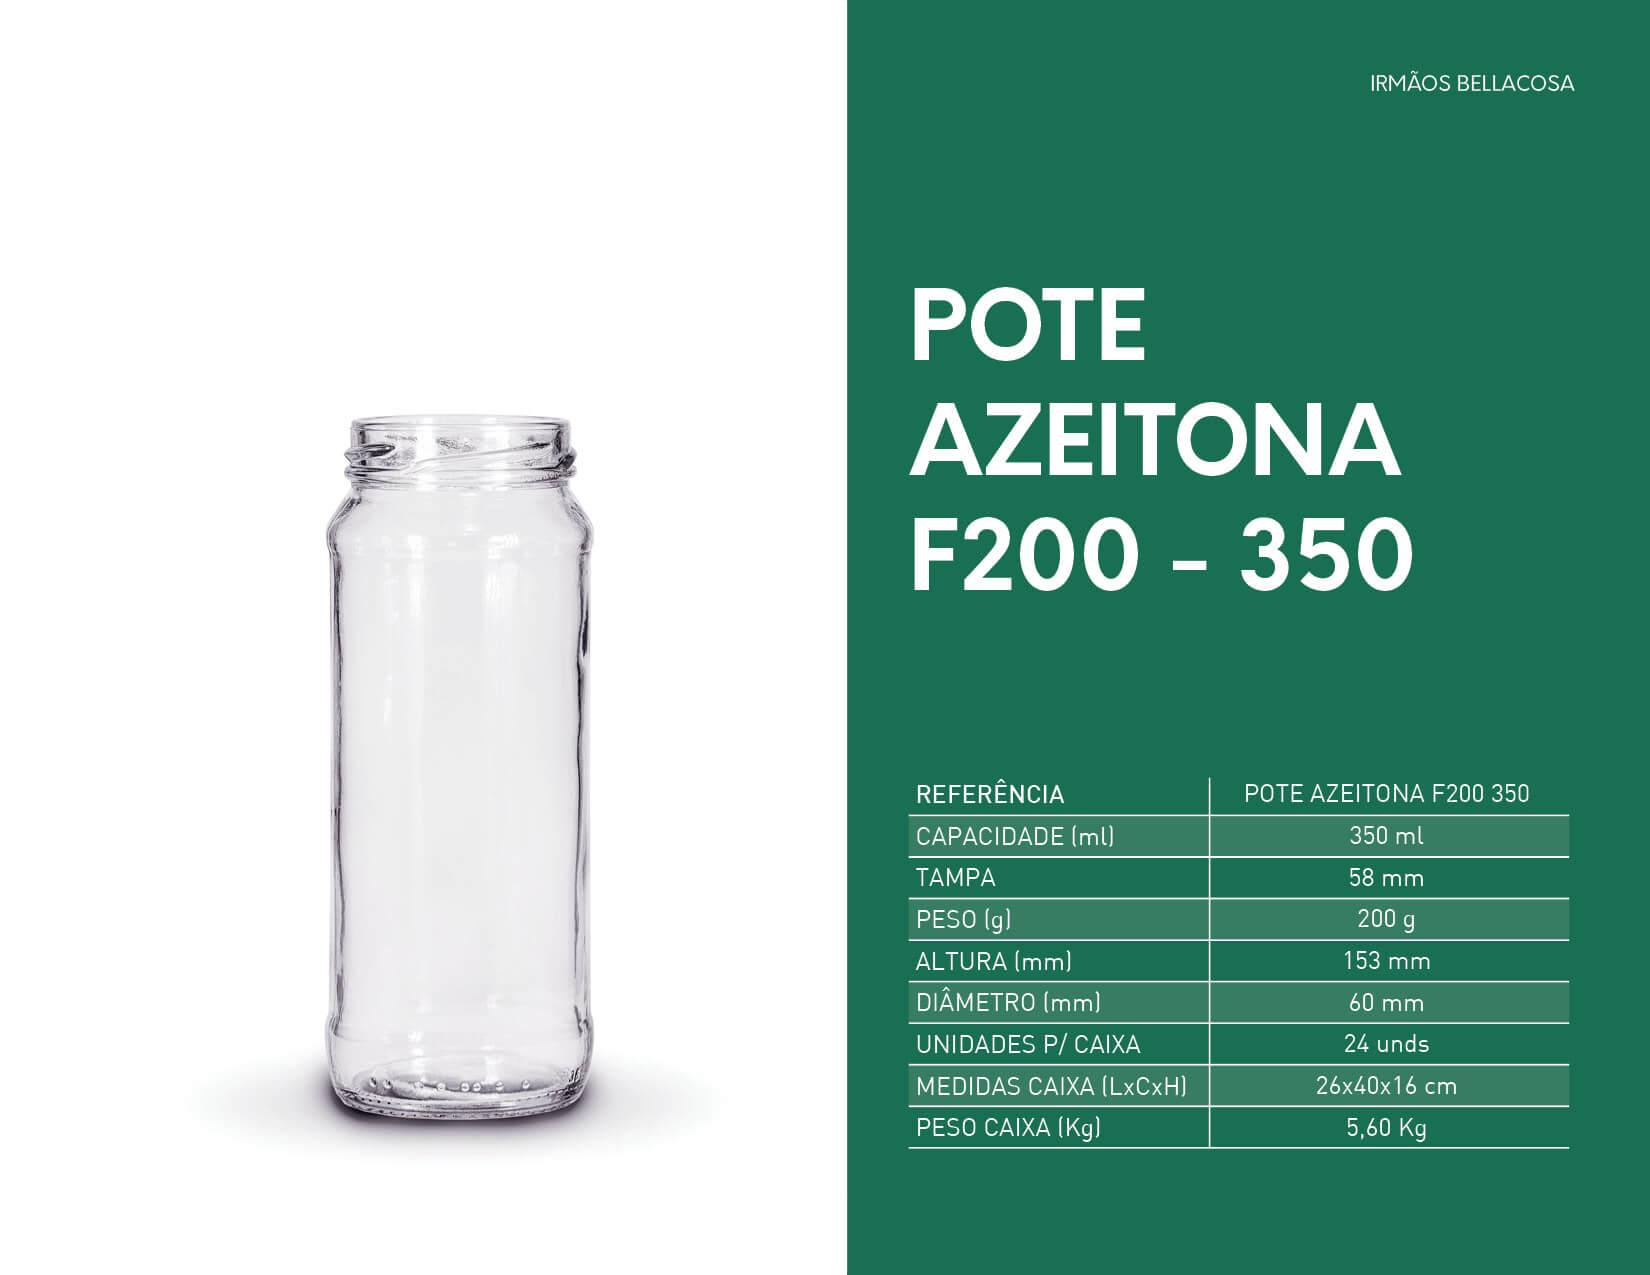 021-Pote-Azeitona-F200-350-irmaos-bellacosa-embalagens-de-vidro